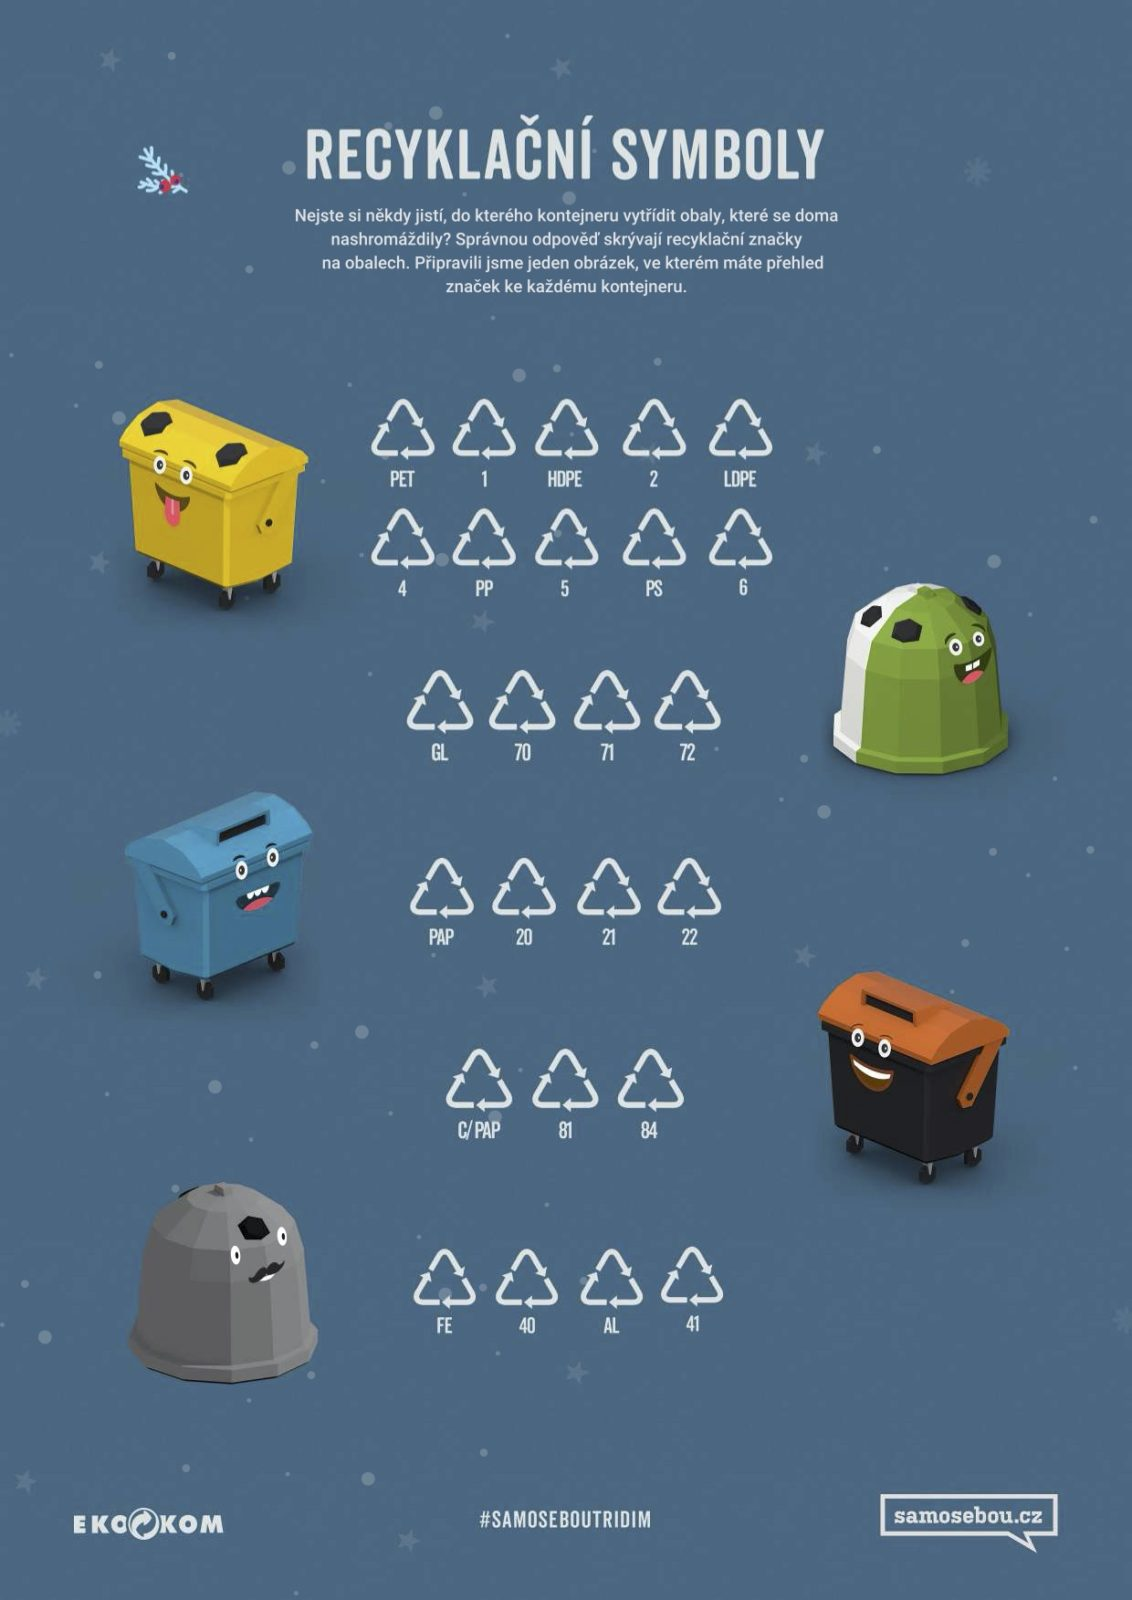 recyklacni_symboly_samosebou_kontejner_modry_zluty_zeleny_oranzovy_sedy_papir_plast_karton_sklo_kov